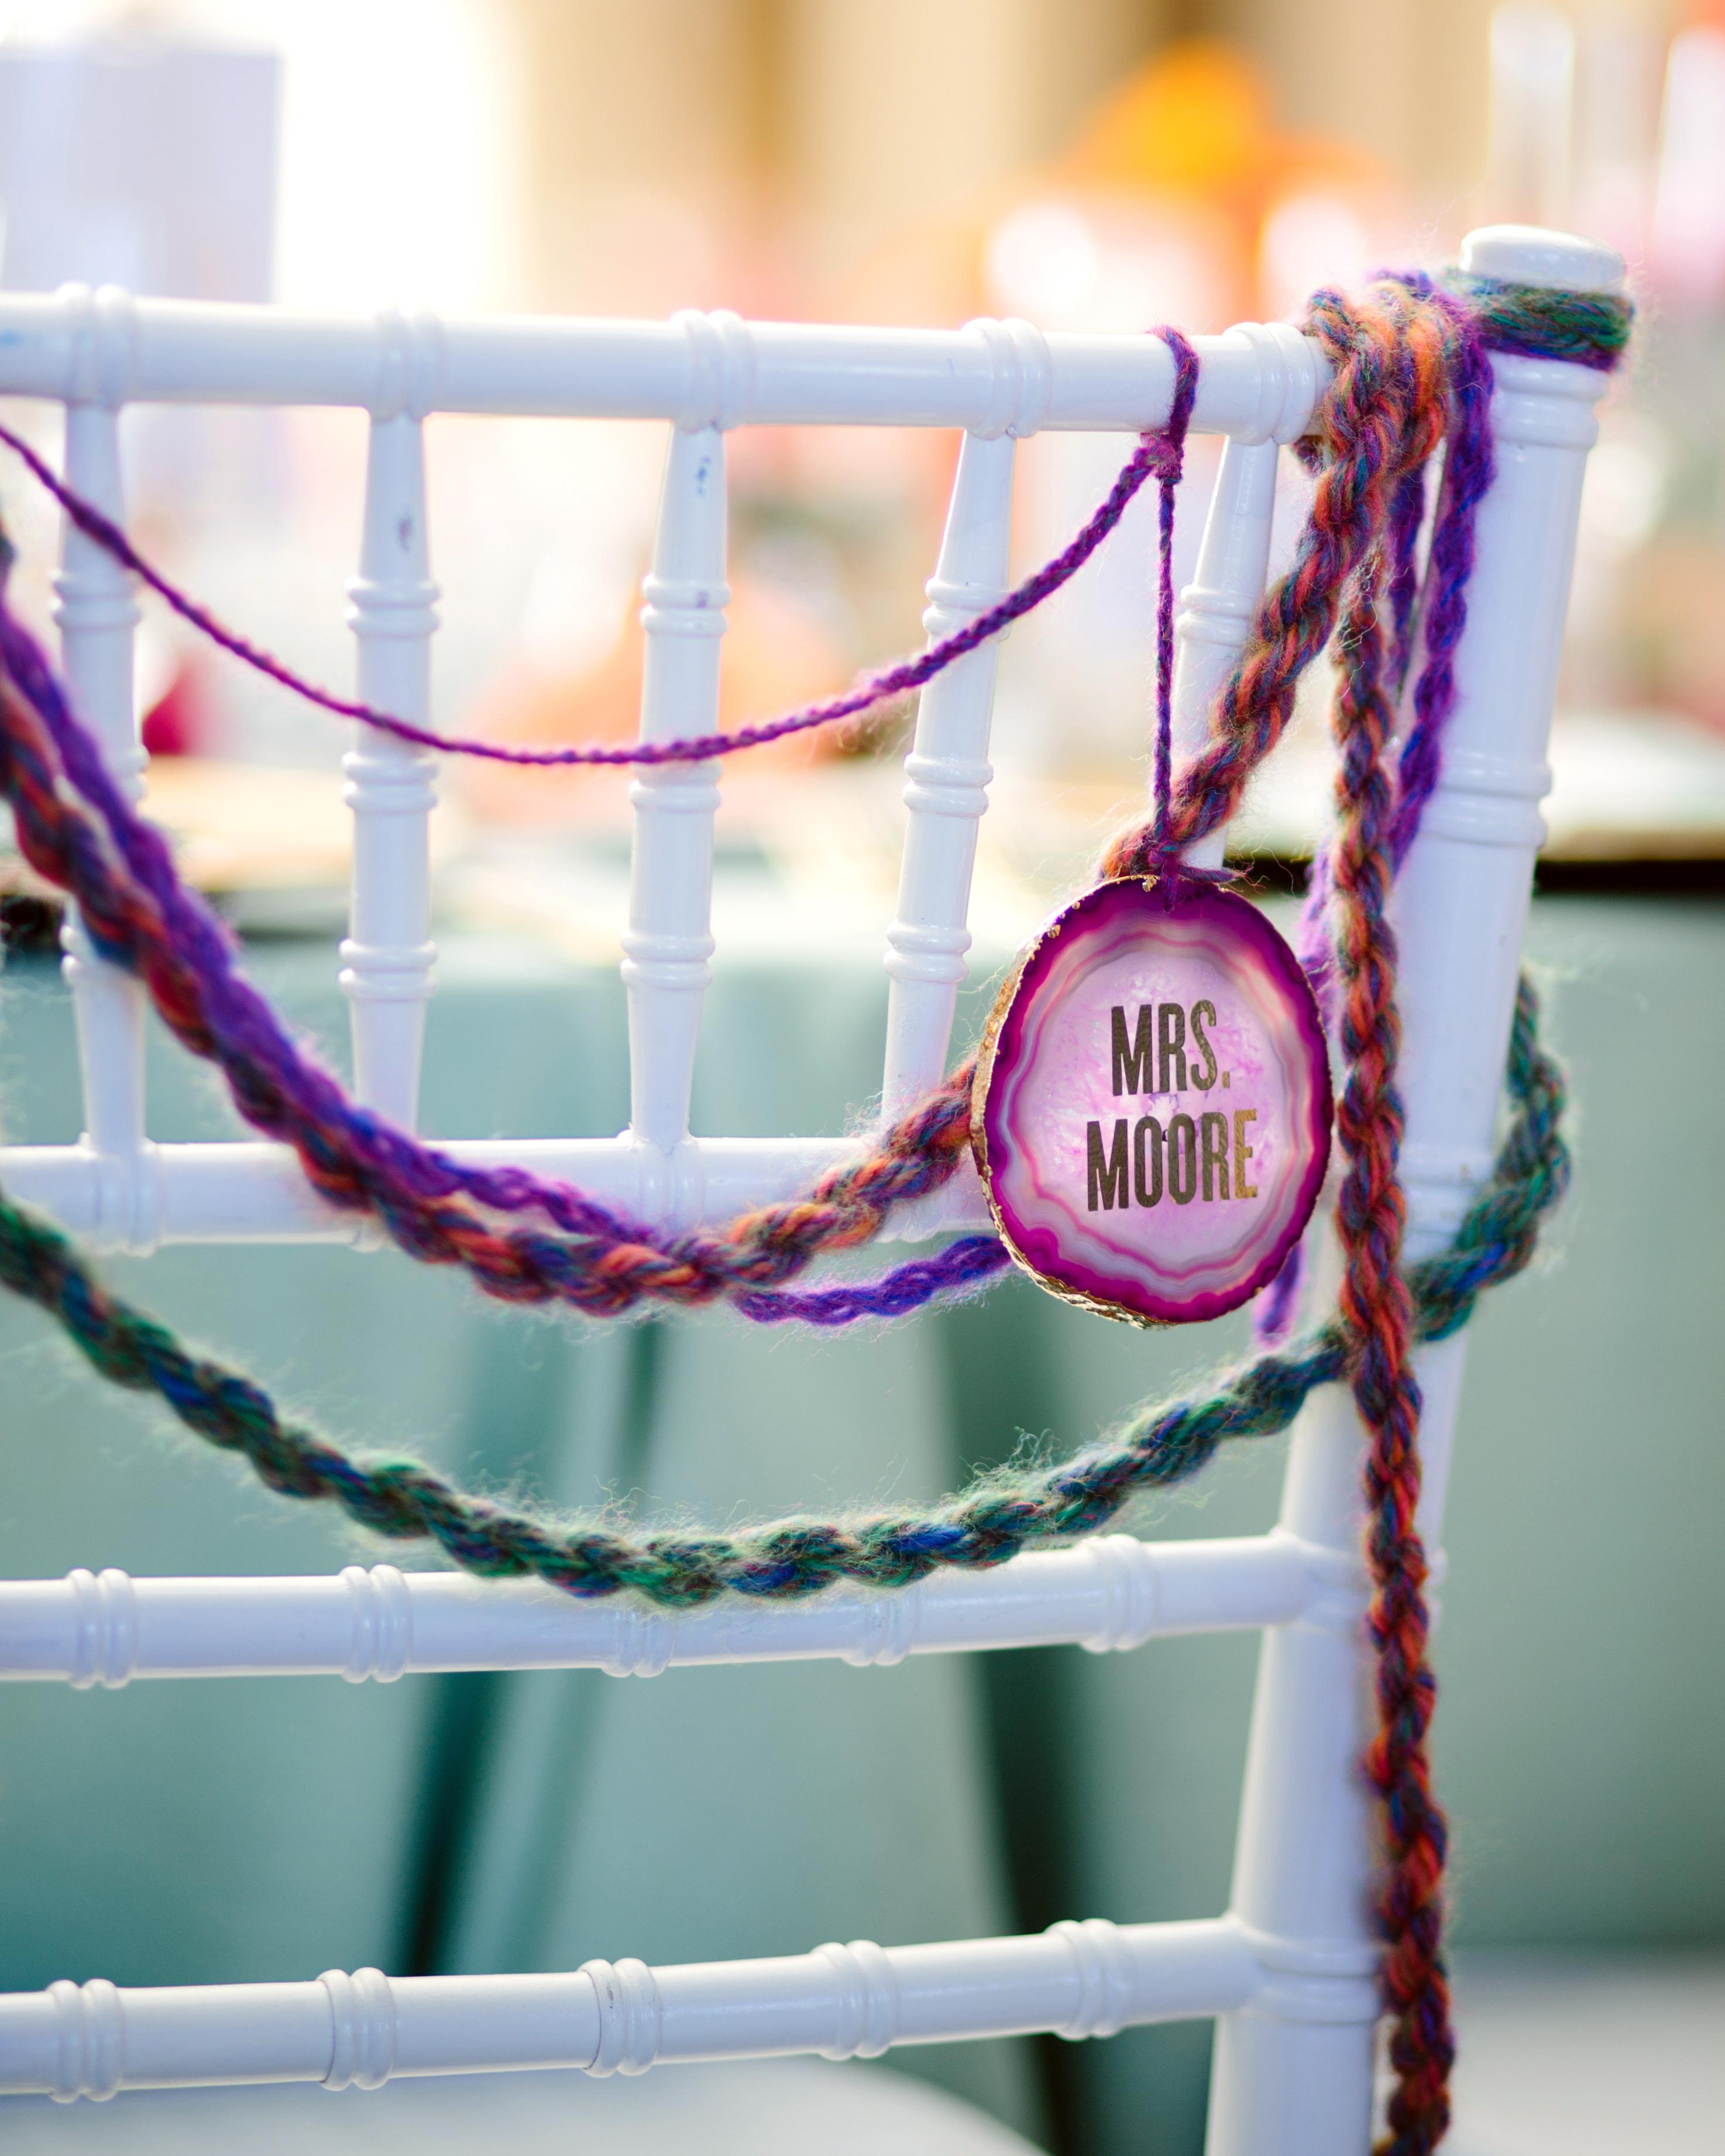 gina-craig-wedding-chair-0514.jpg